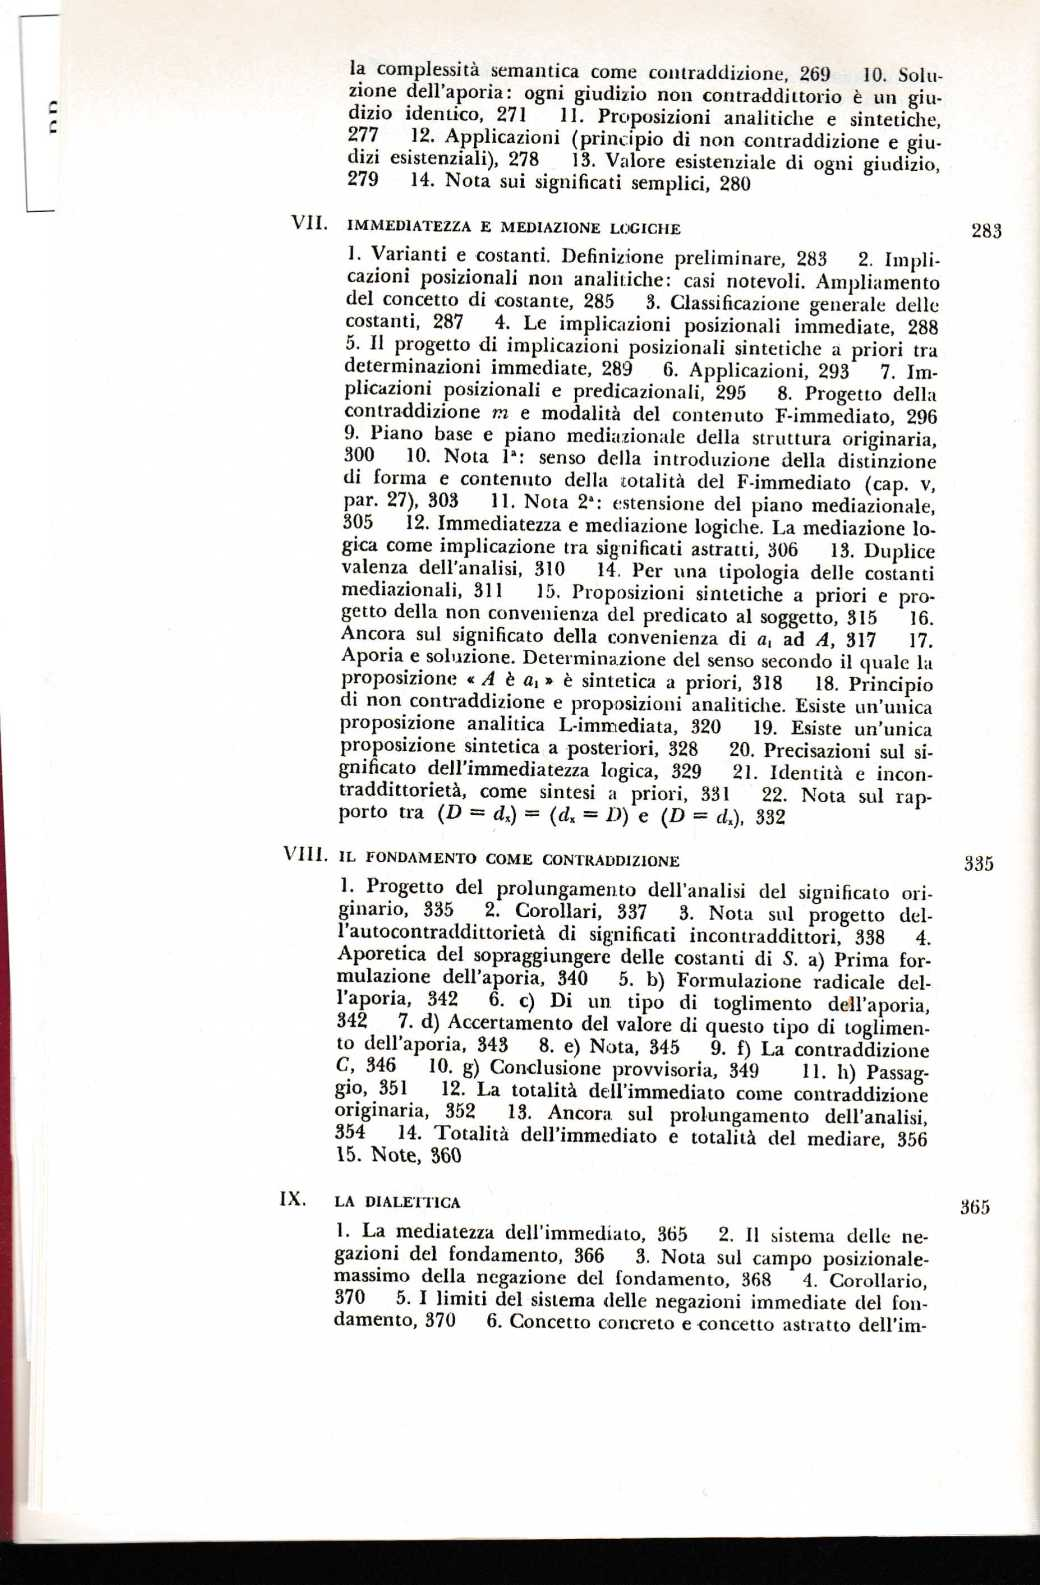 strutturaoriginaria4318